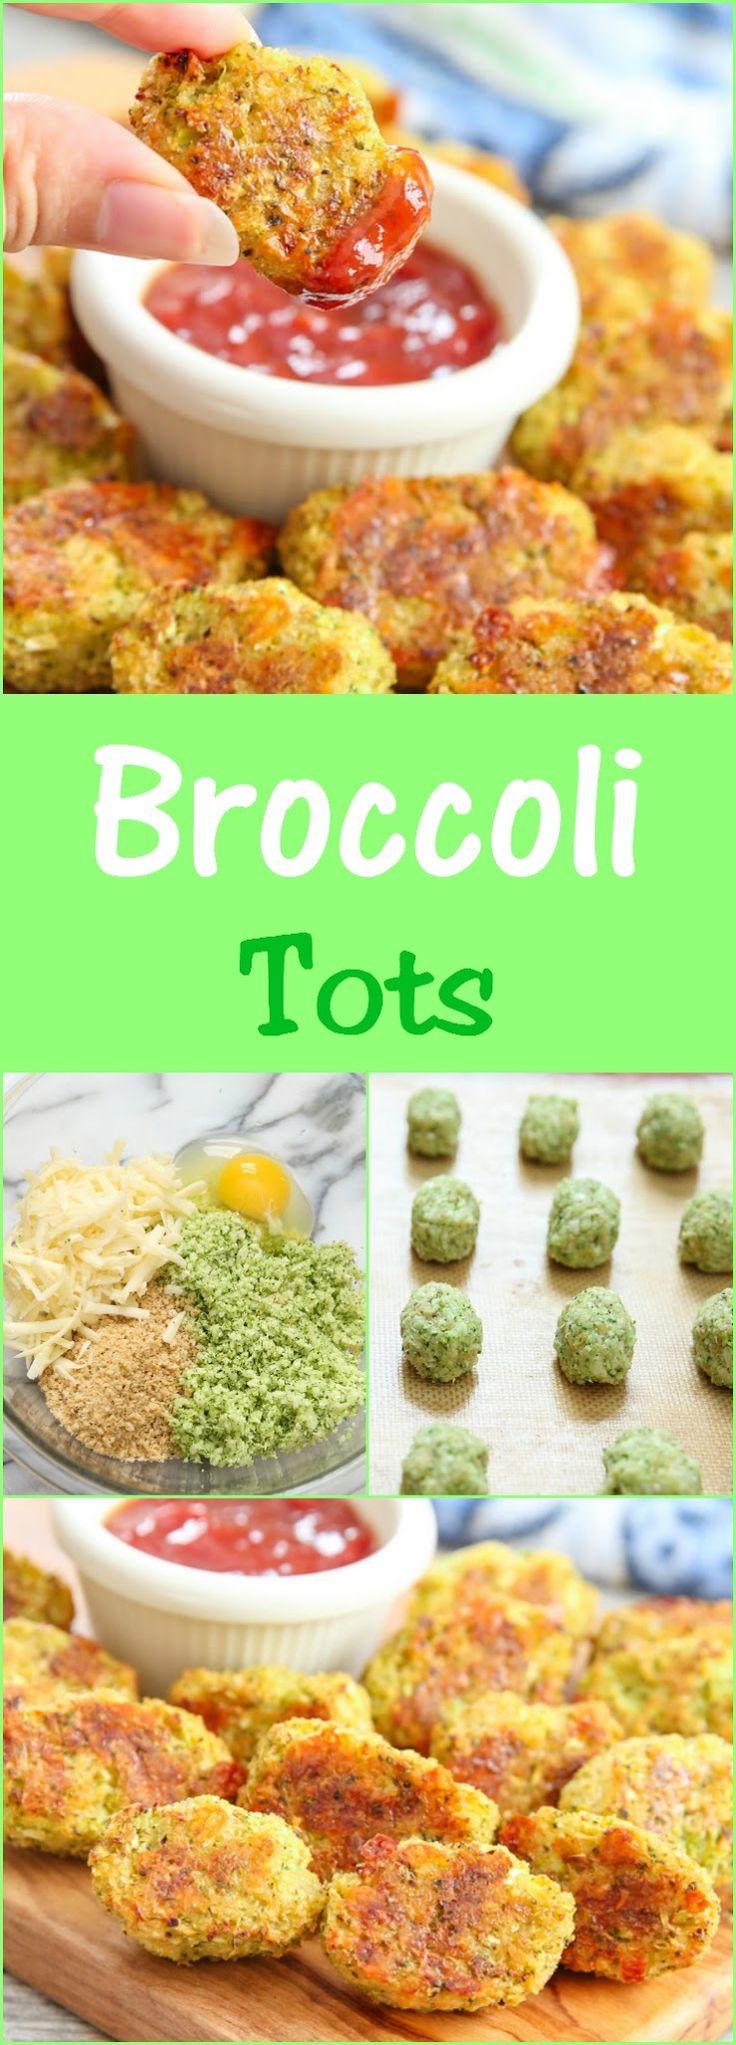 Broccoli Tots | Kirbie's Cravings | A San Diego food & travel blog